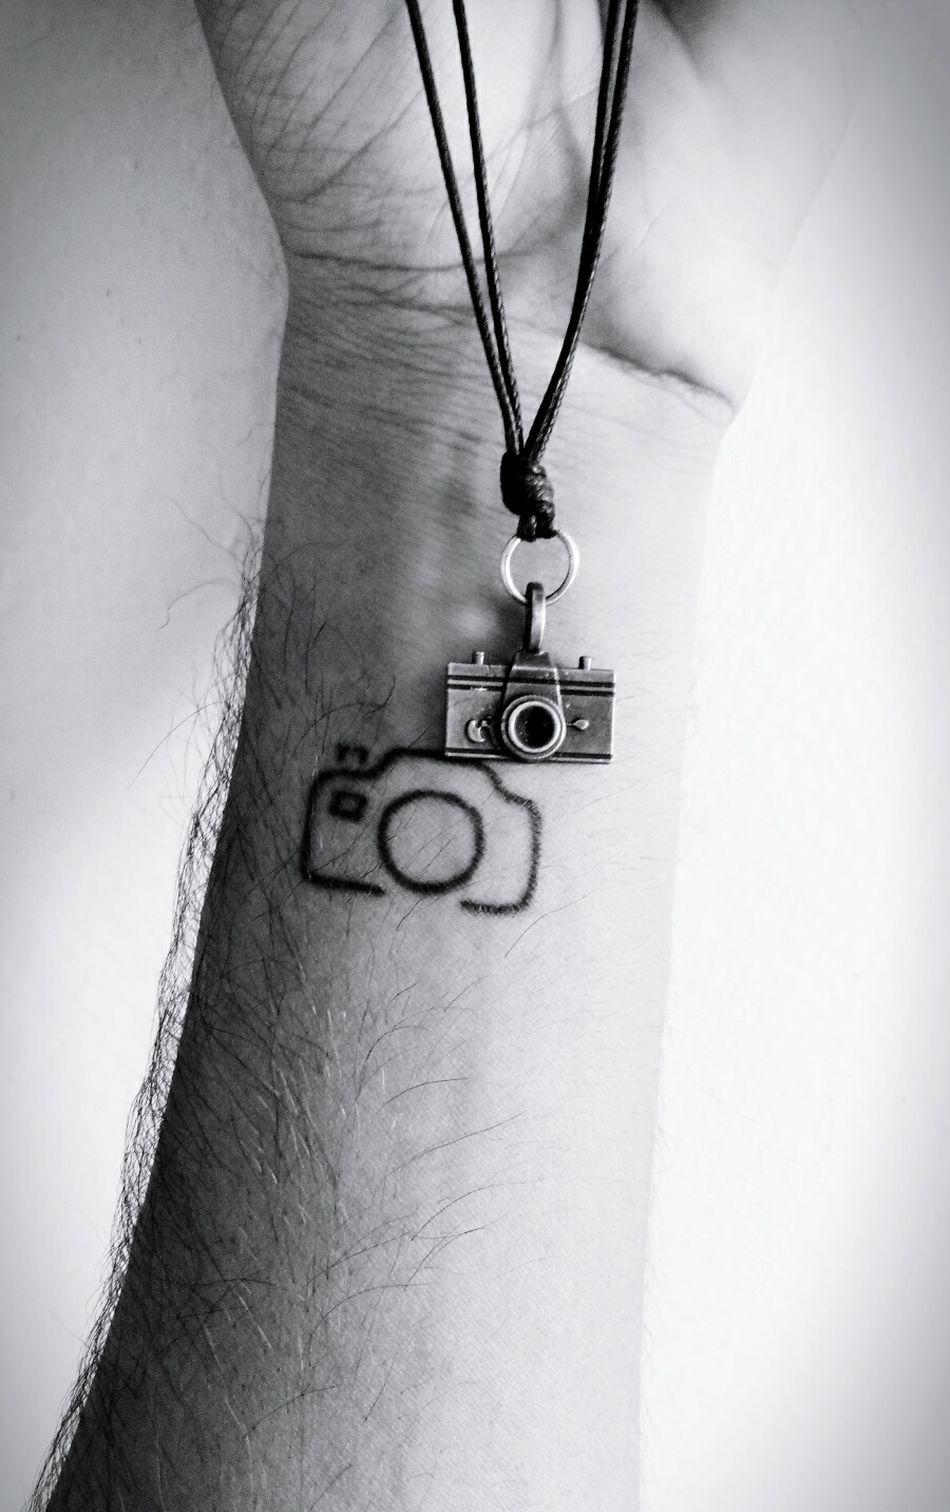 Camera Camera - Photographic Equipment Camera Life Is My Life! Camera Porn Tattoo ❤ Tatoostyle Tattoed Boy Tattoed Men Tattoedchics Cameratattoo